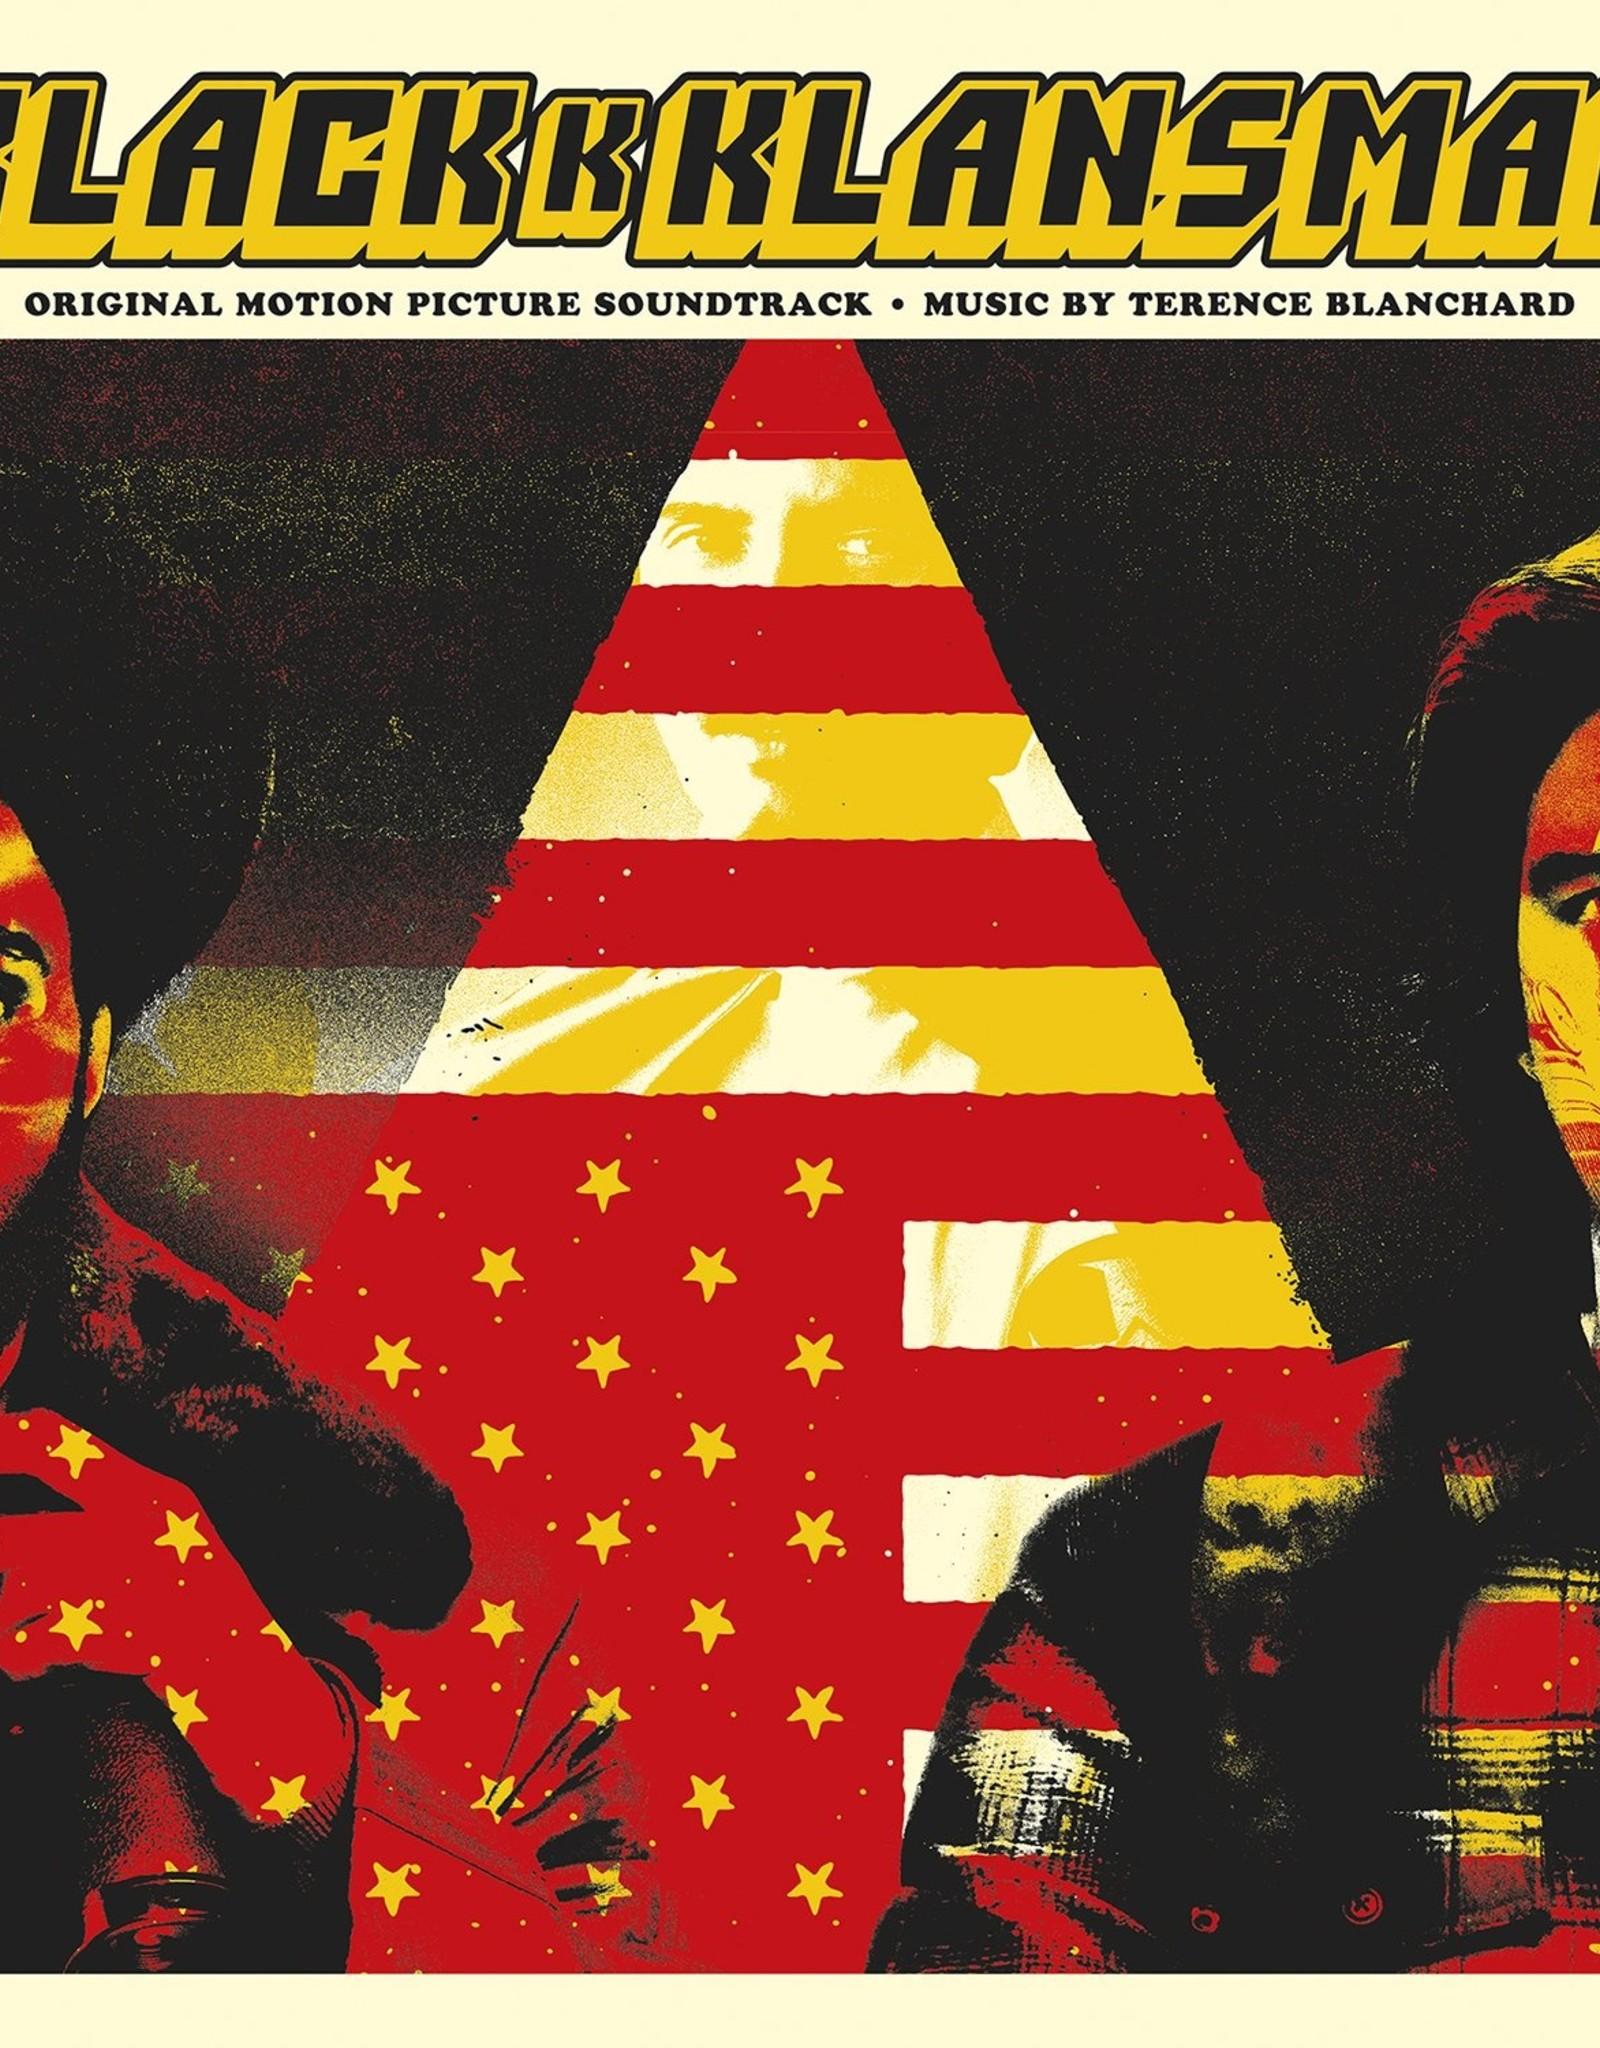 Terence Blanchard - Blackkklansman (Lp)